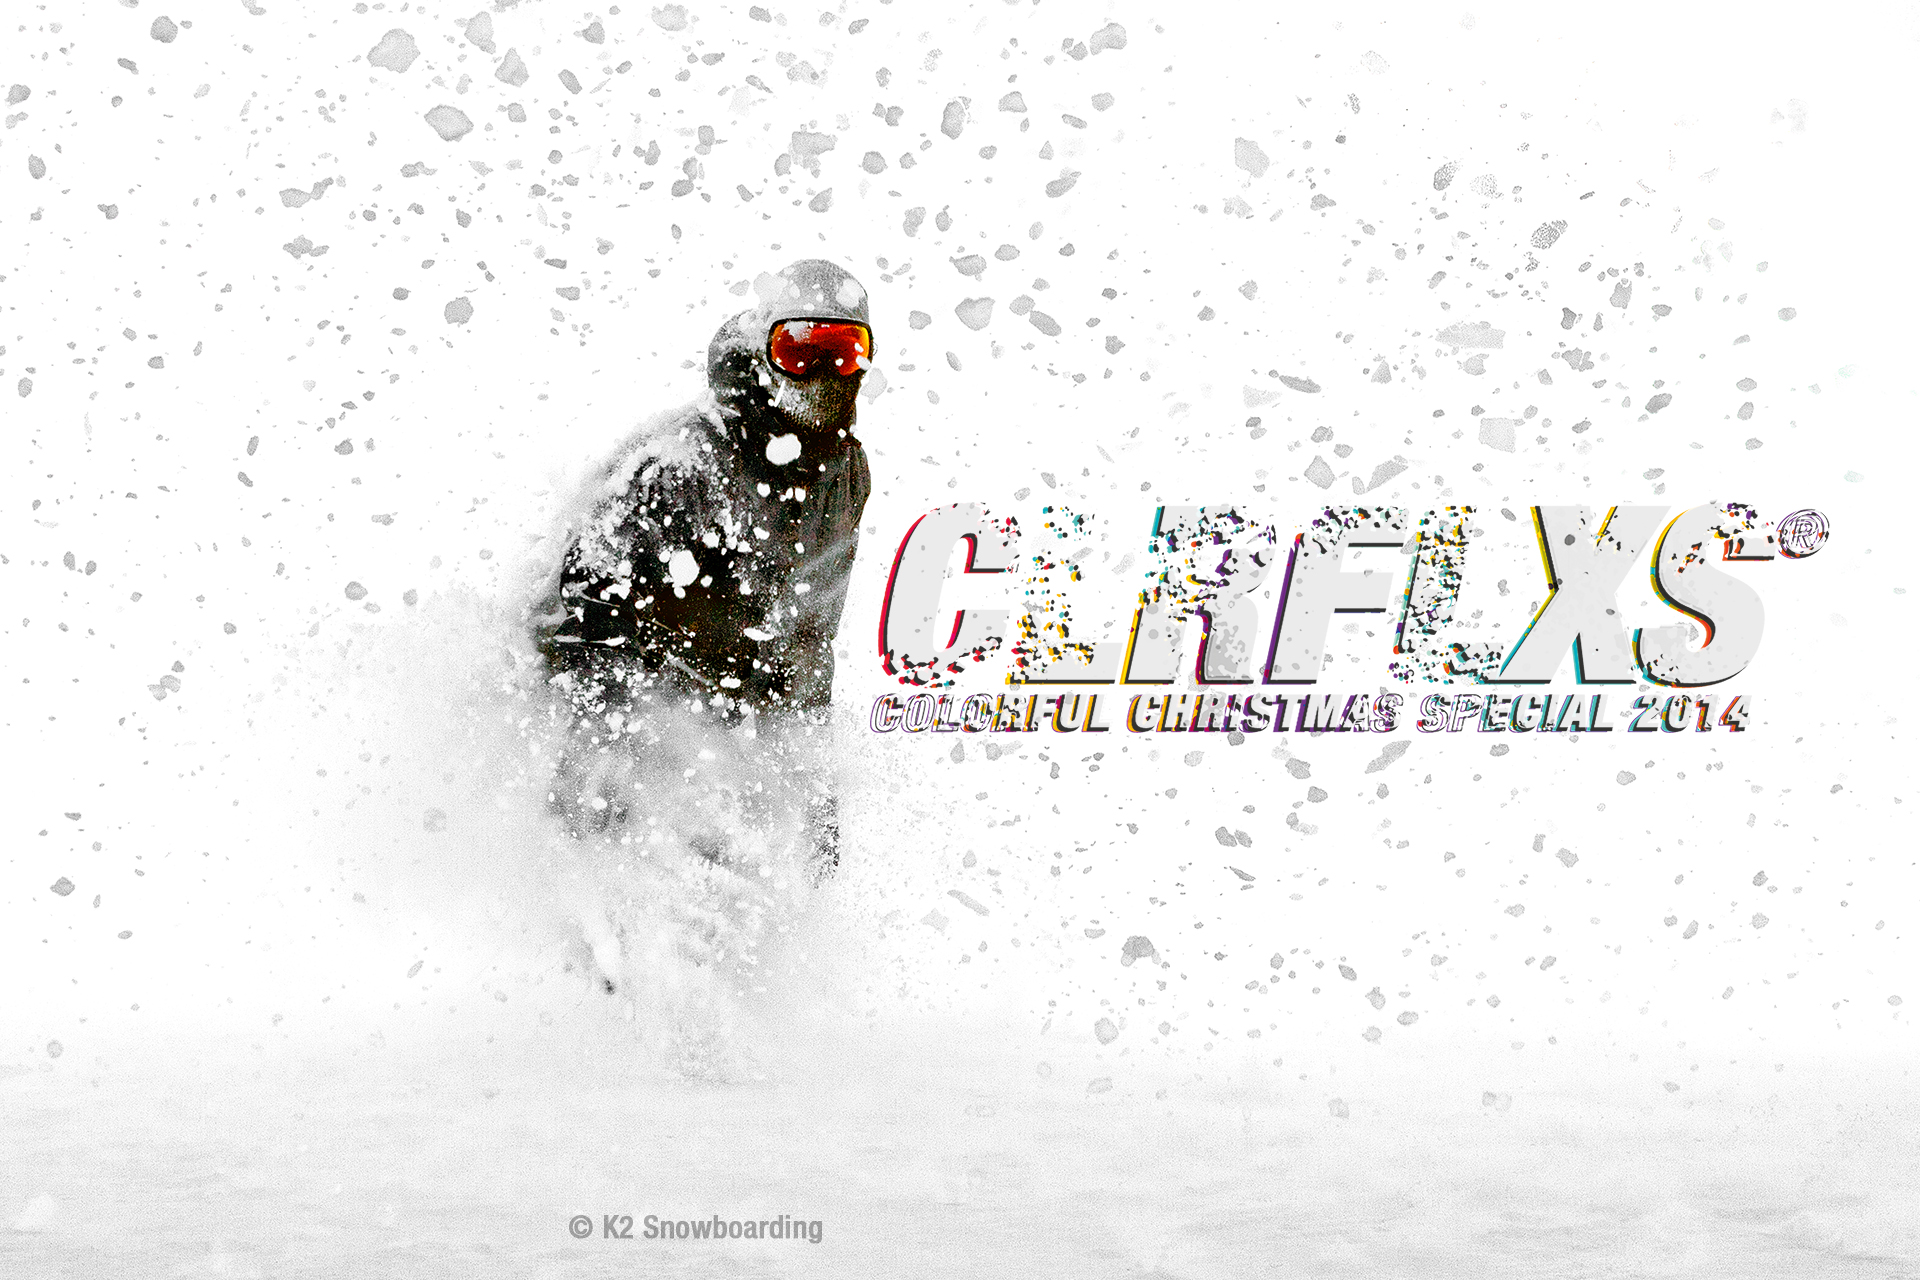 CLRFLXS Adventsblog - THE COLORFUL CHRISTMAS 2014: Ein Sportlicher Adventsblog